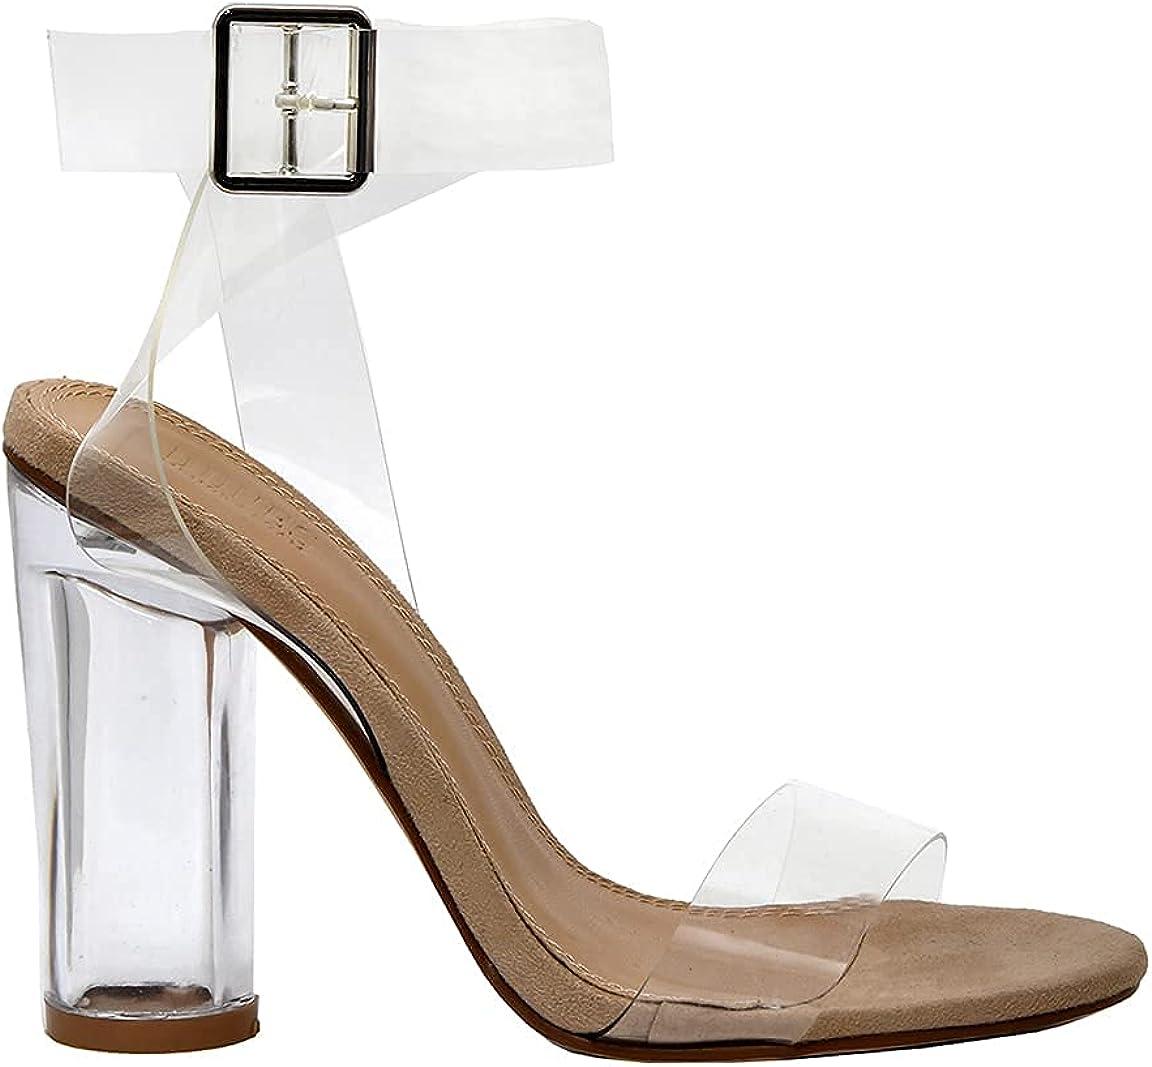 Dunes Women's Quantity limited Nellie Lucite Heel Foam +Memory Insoles Sandal Max 89% OFF